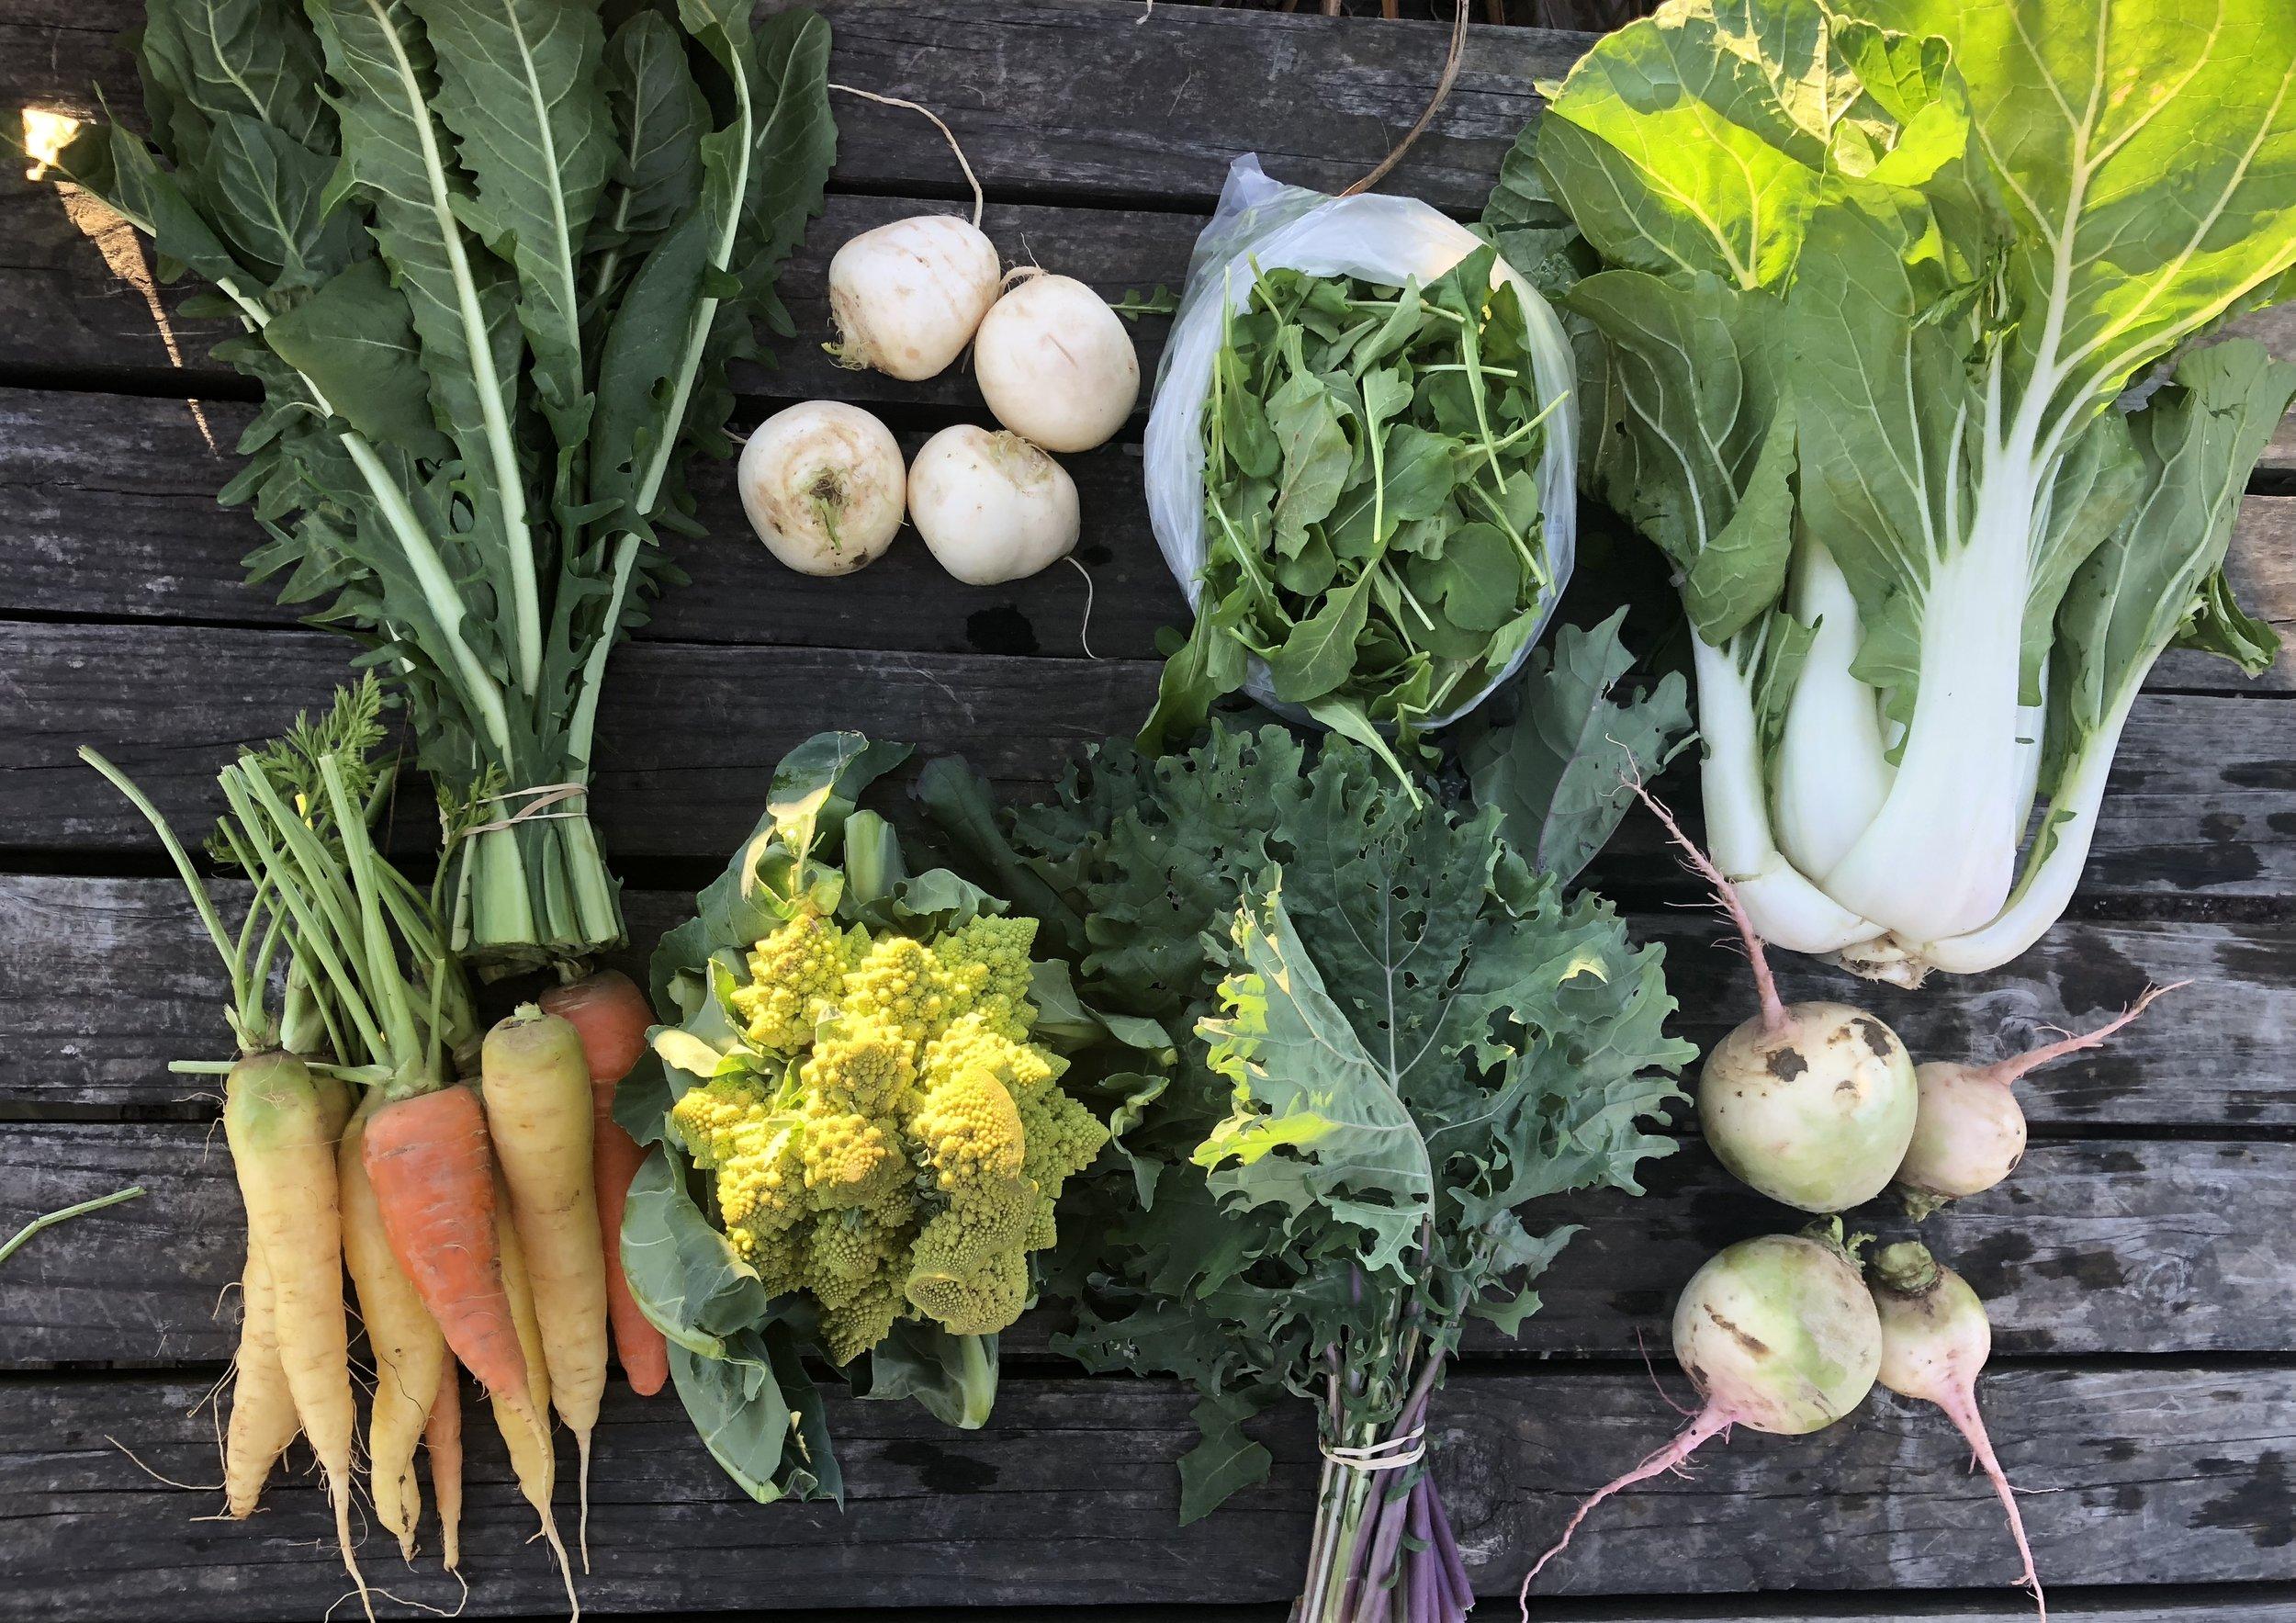 Top Row: Dandelion Greens, Hakurei Turnips, Arugula, and Bok Choy  Bottom Row: Carrots, Cauliflower (Romanesco), Red Russian Kale, and Watermelon Radishes